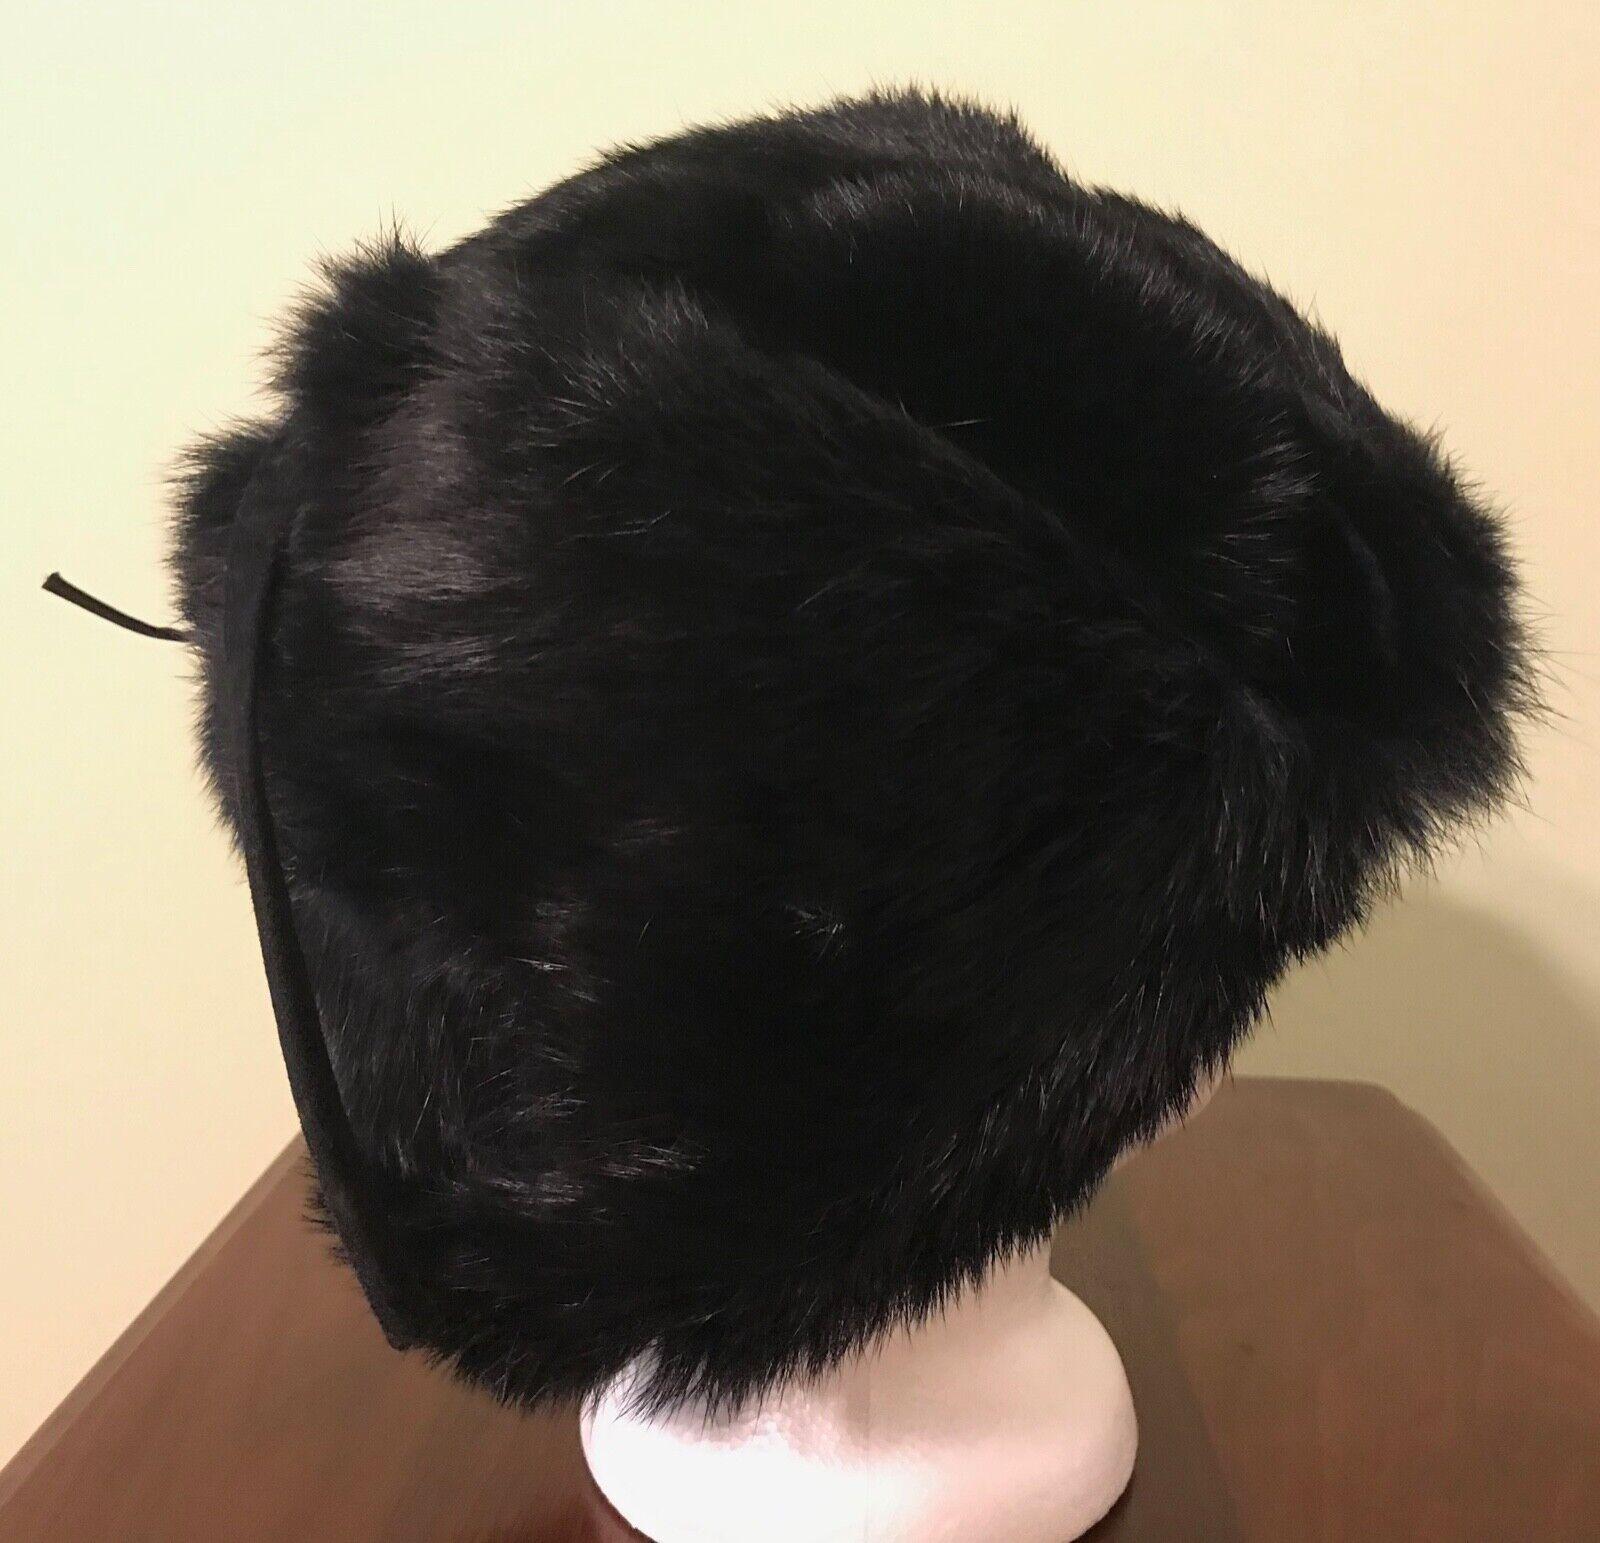 Vintage Black Mink Ladies' Hat with Flap Ear Muffs - image 3